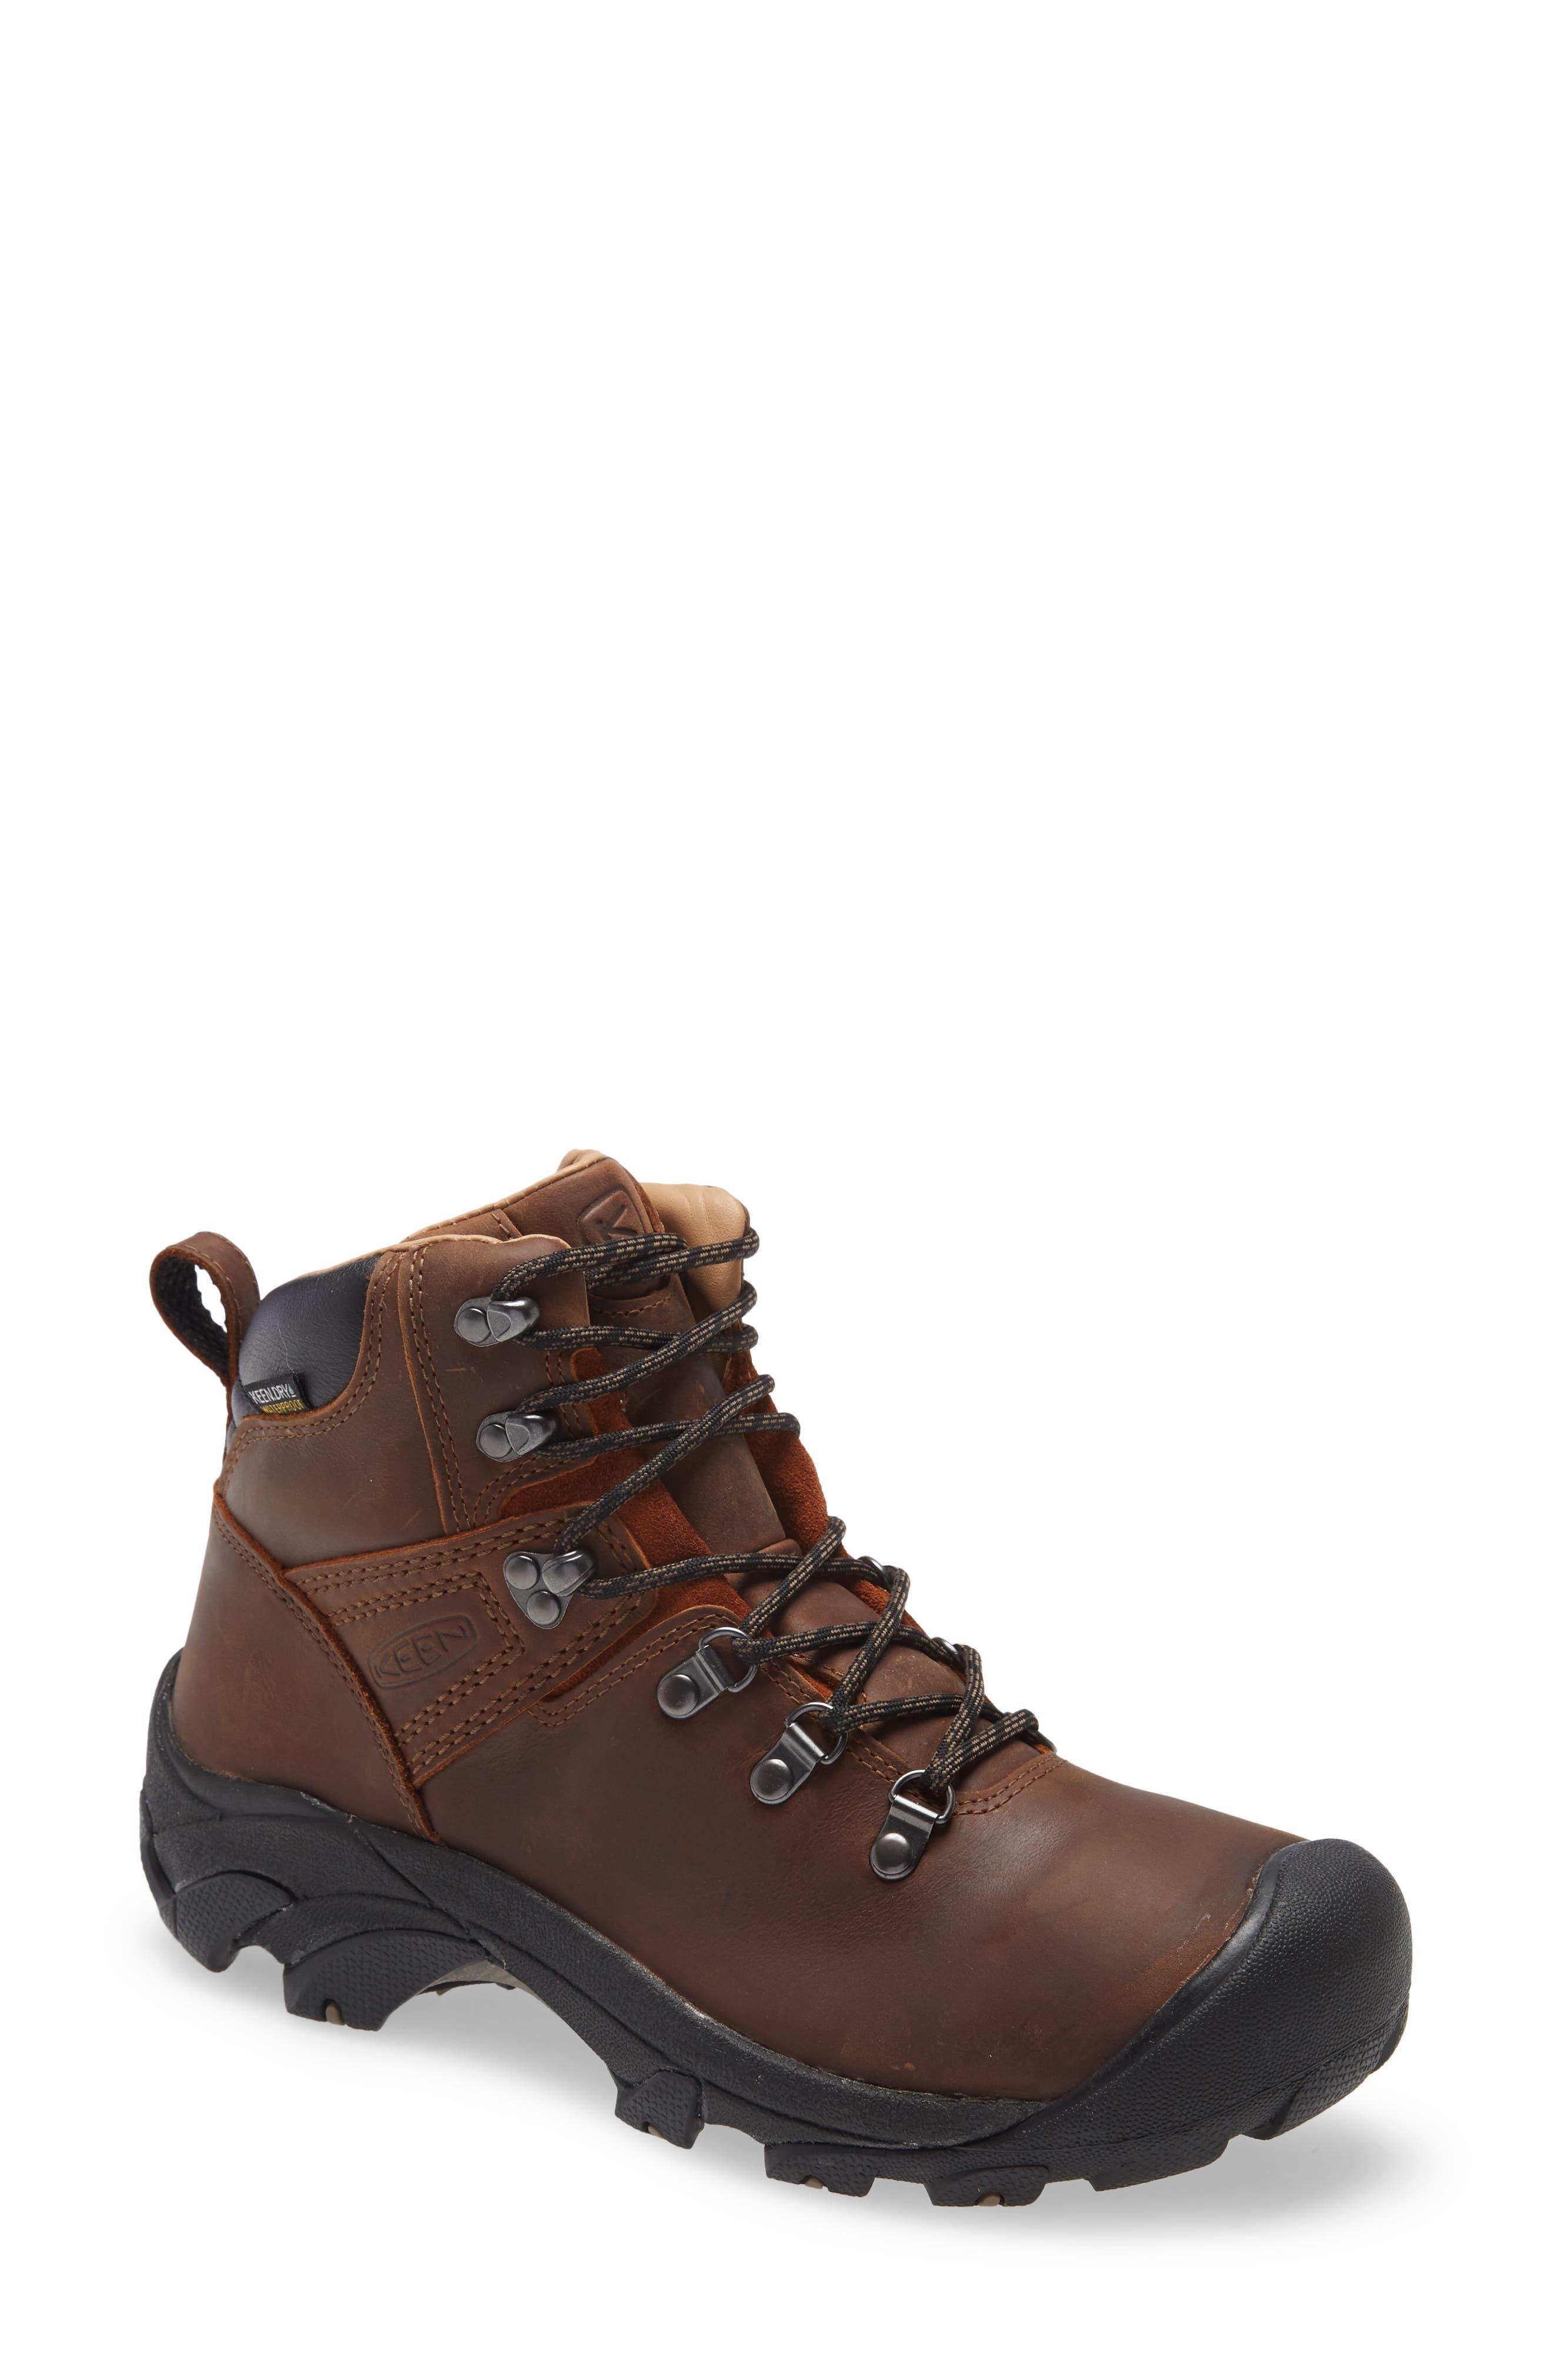 Pyrenees Hiking Boot